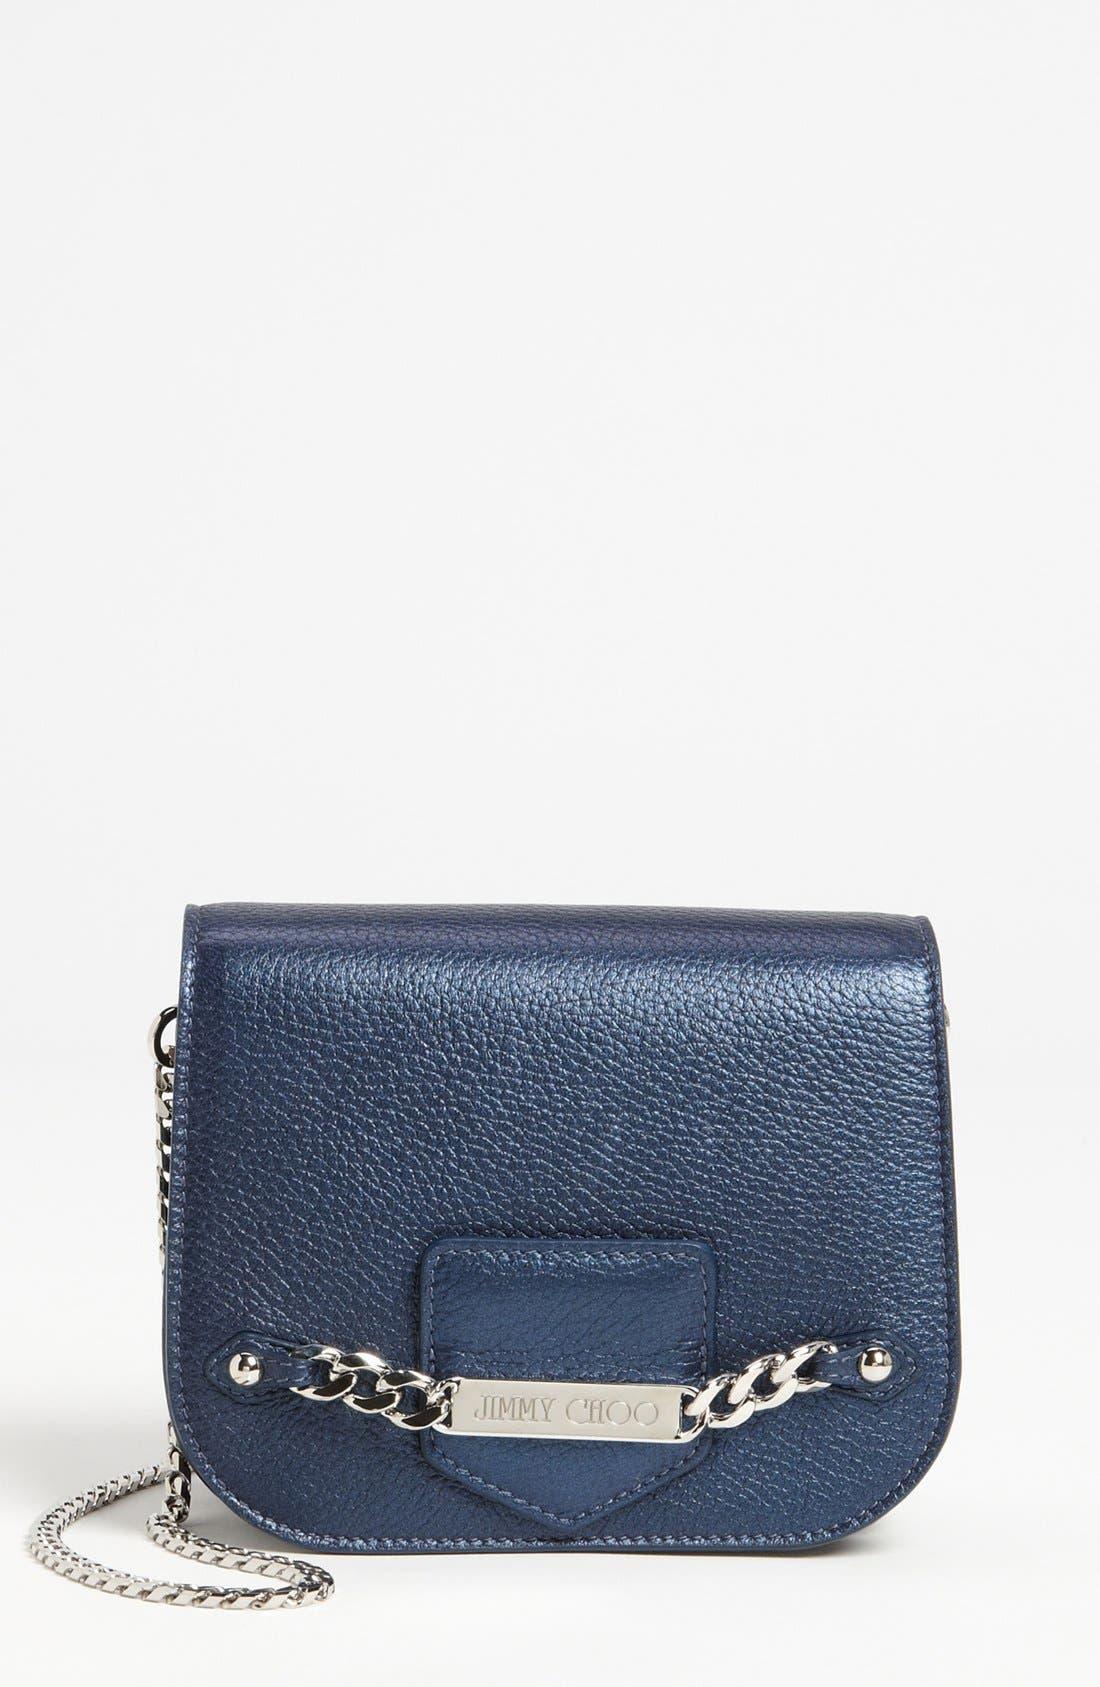 Main Image - Jimmy Choo 'Shadow' Pearlized Leather Crossbody Bag